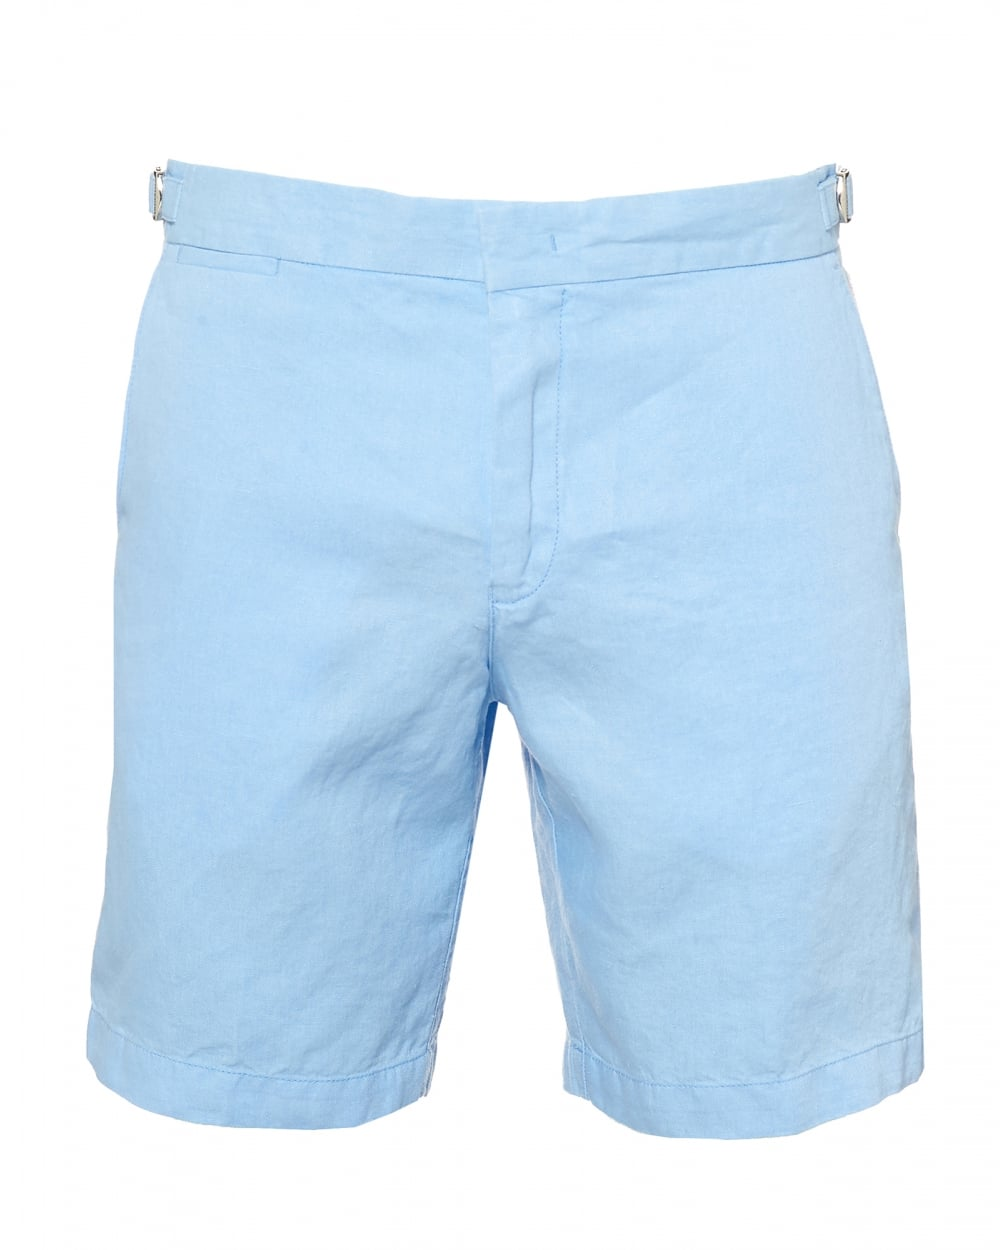 Orlebar Brown Mens Norwich Tailored Fit Linen Blue Shorts b2a61278d